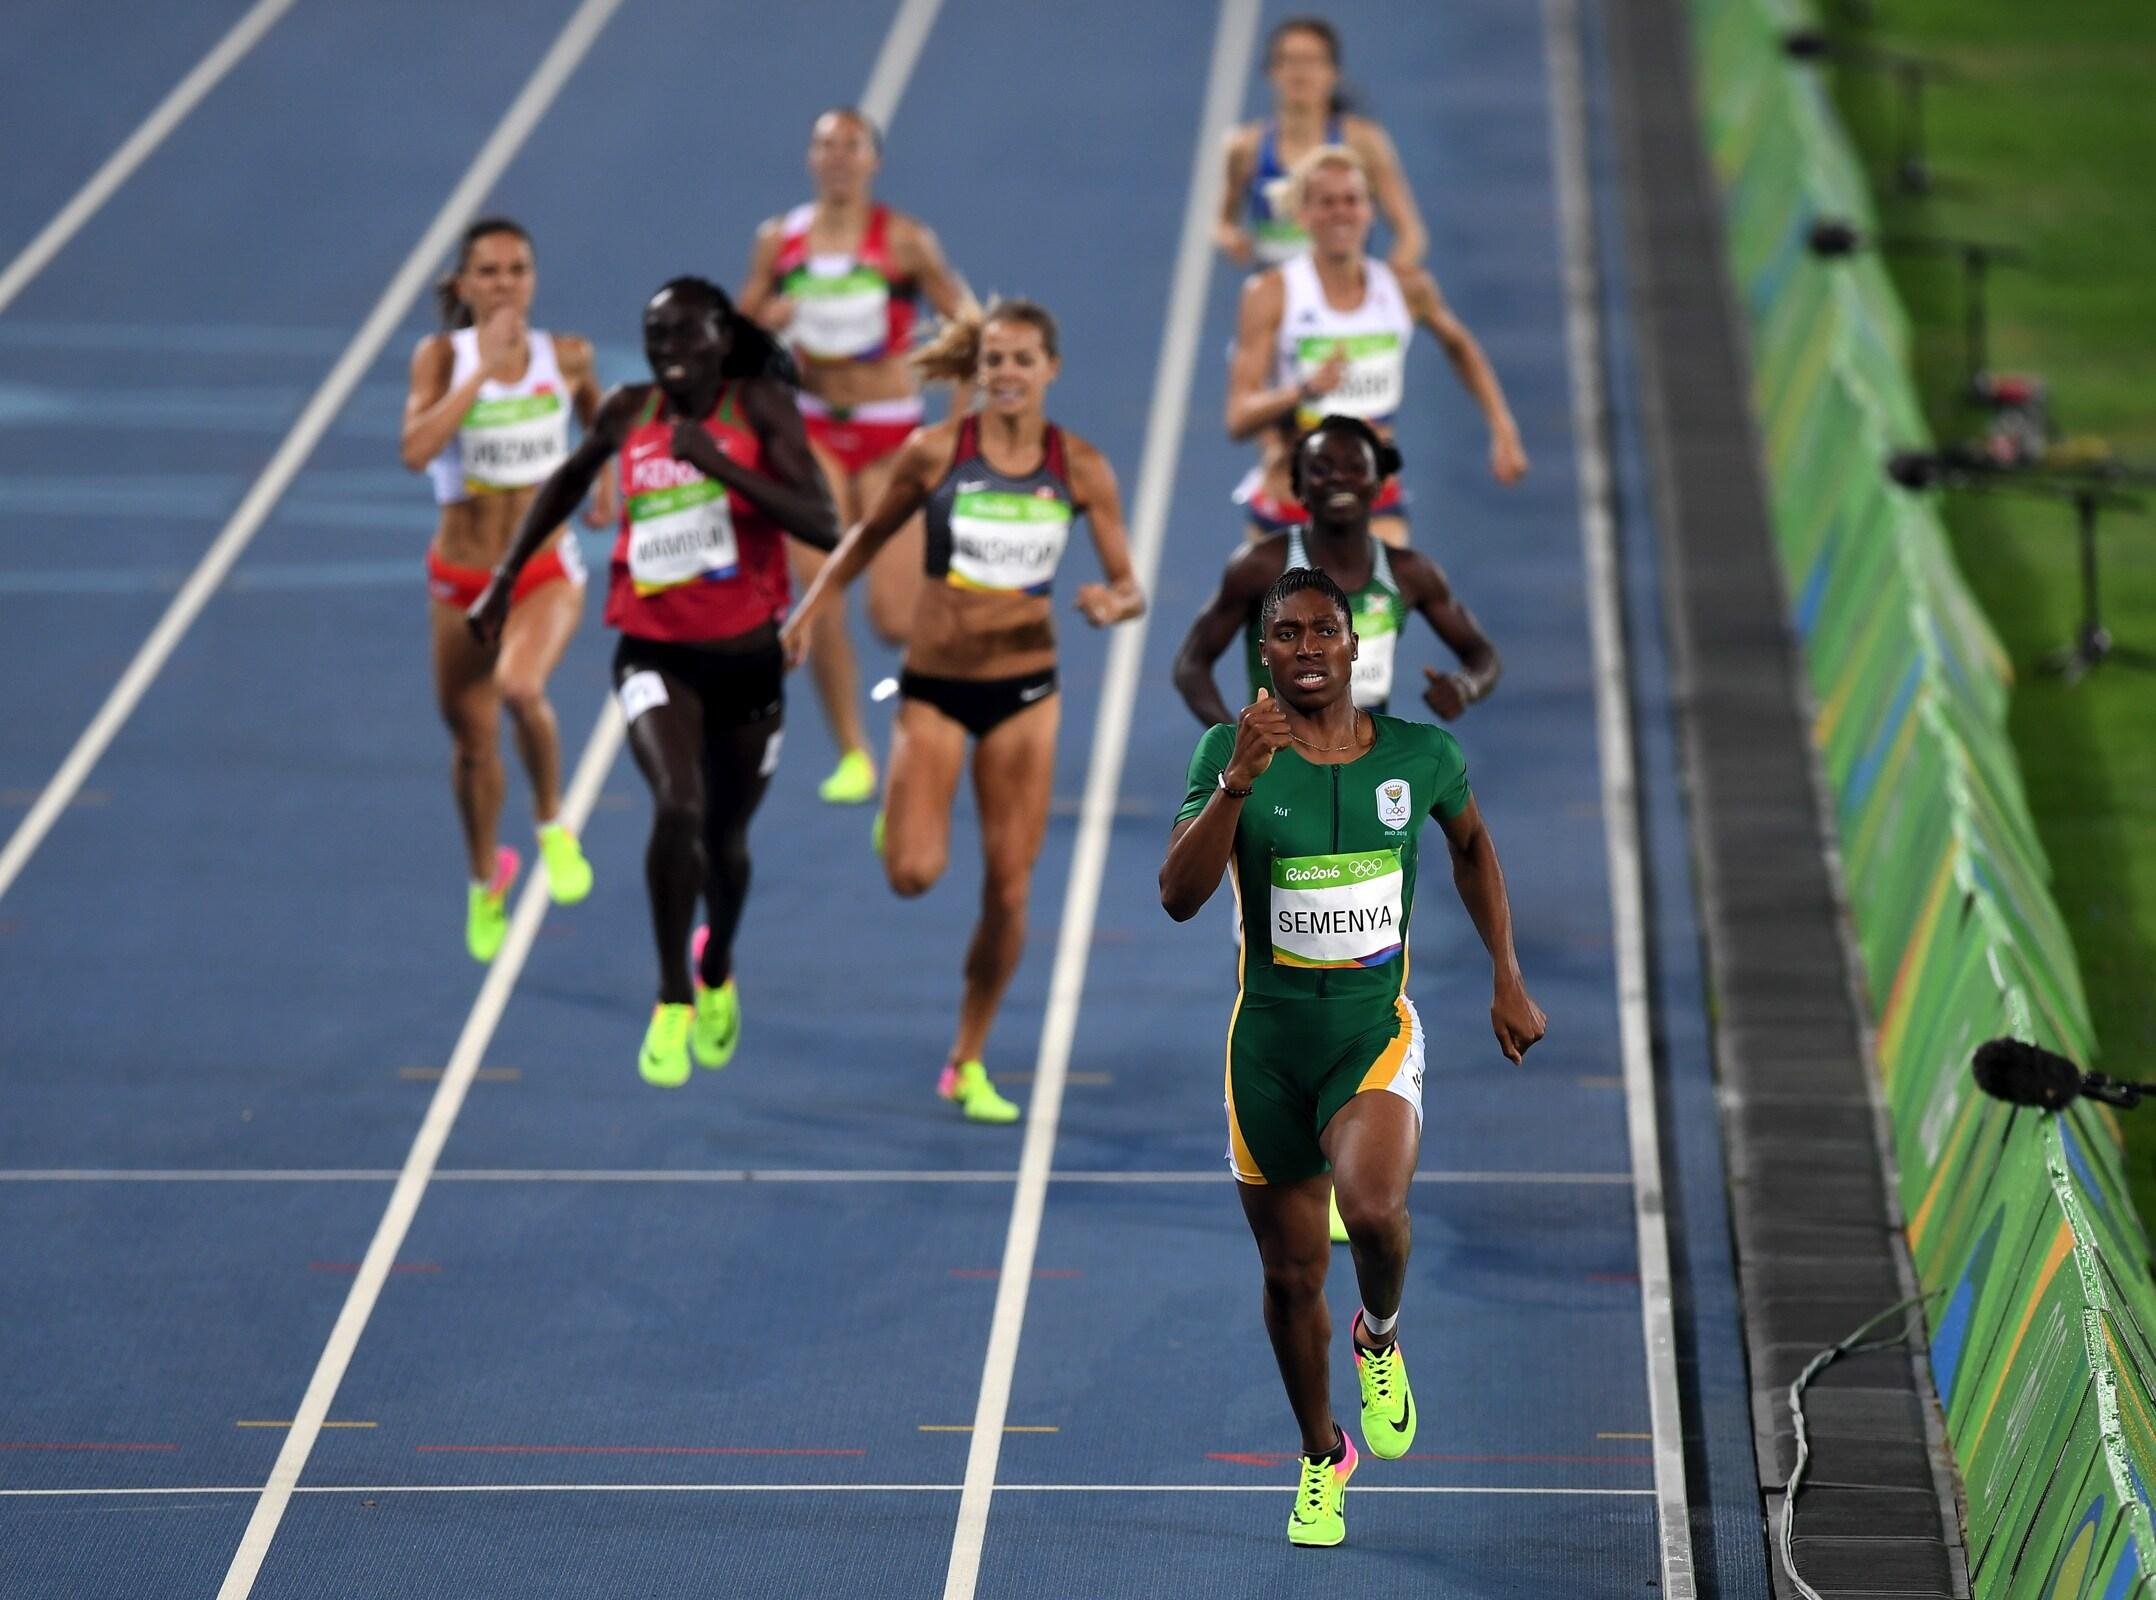 Athletics - Women's 800m